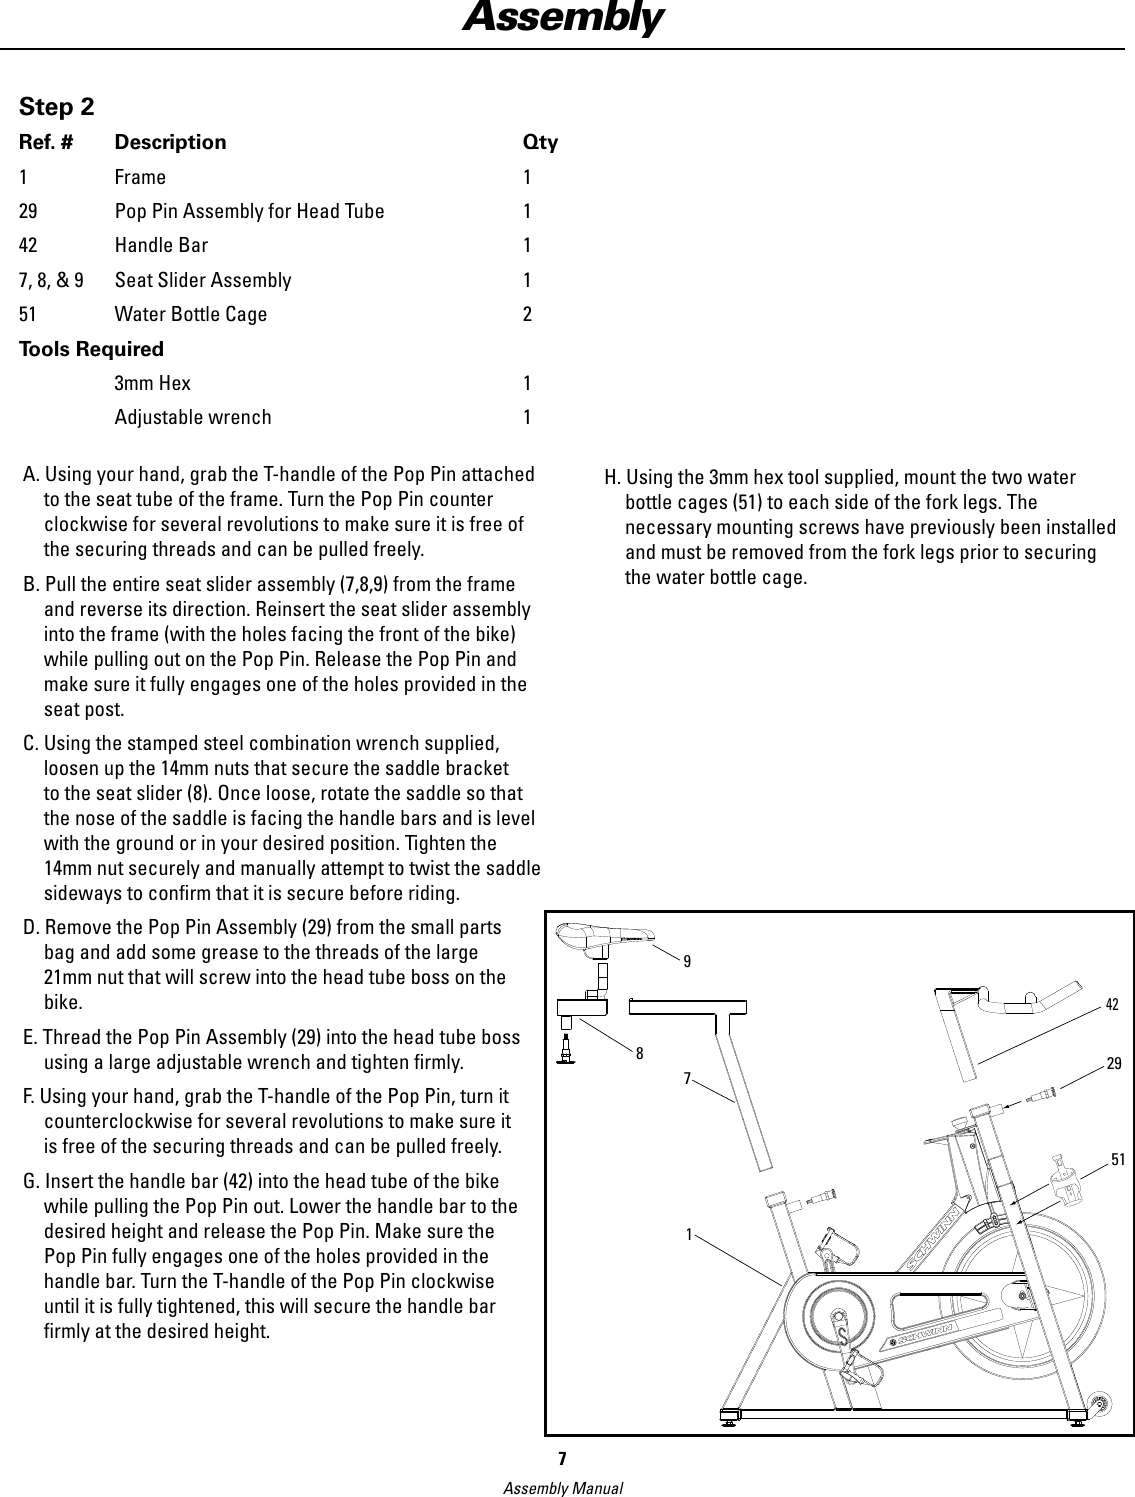 Schwinn Ic Elite Assembly Manual Manual Guide